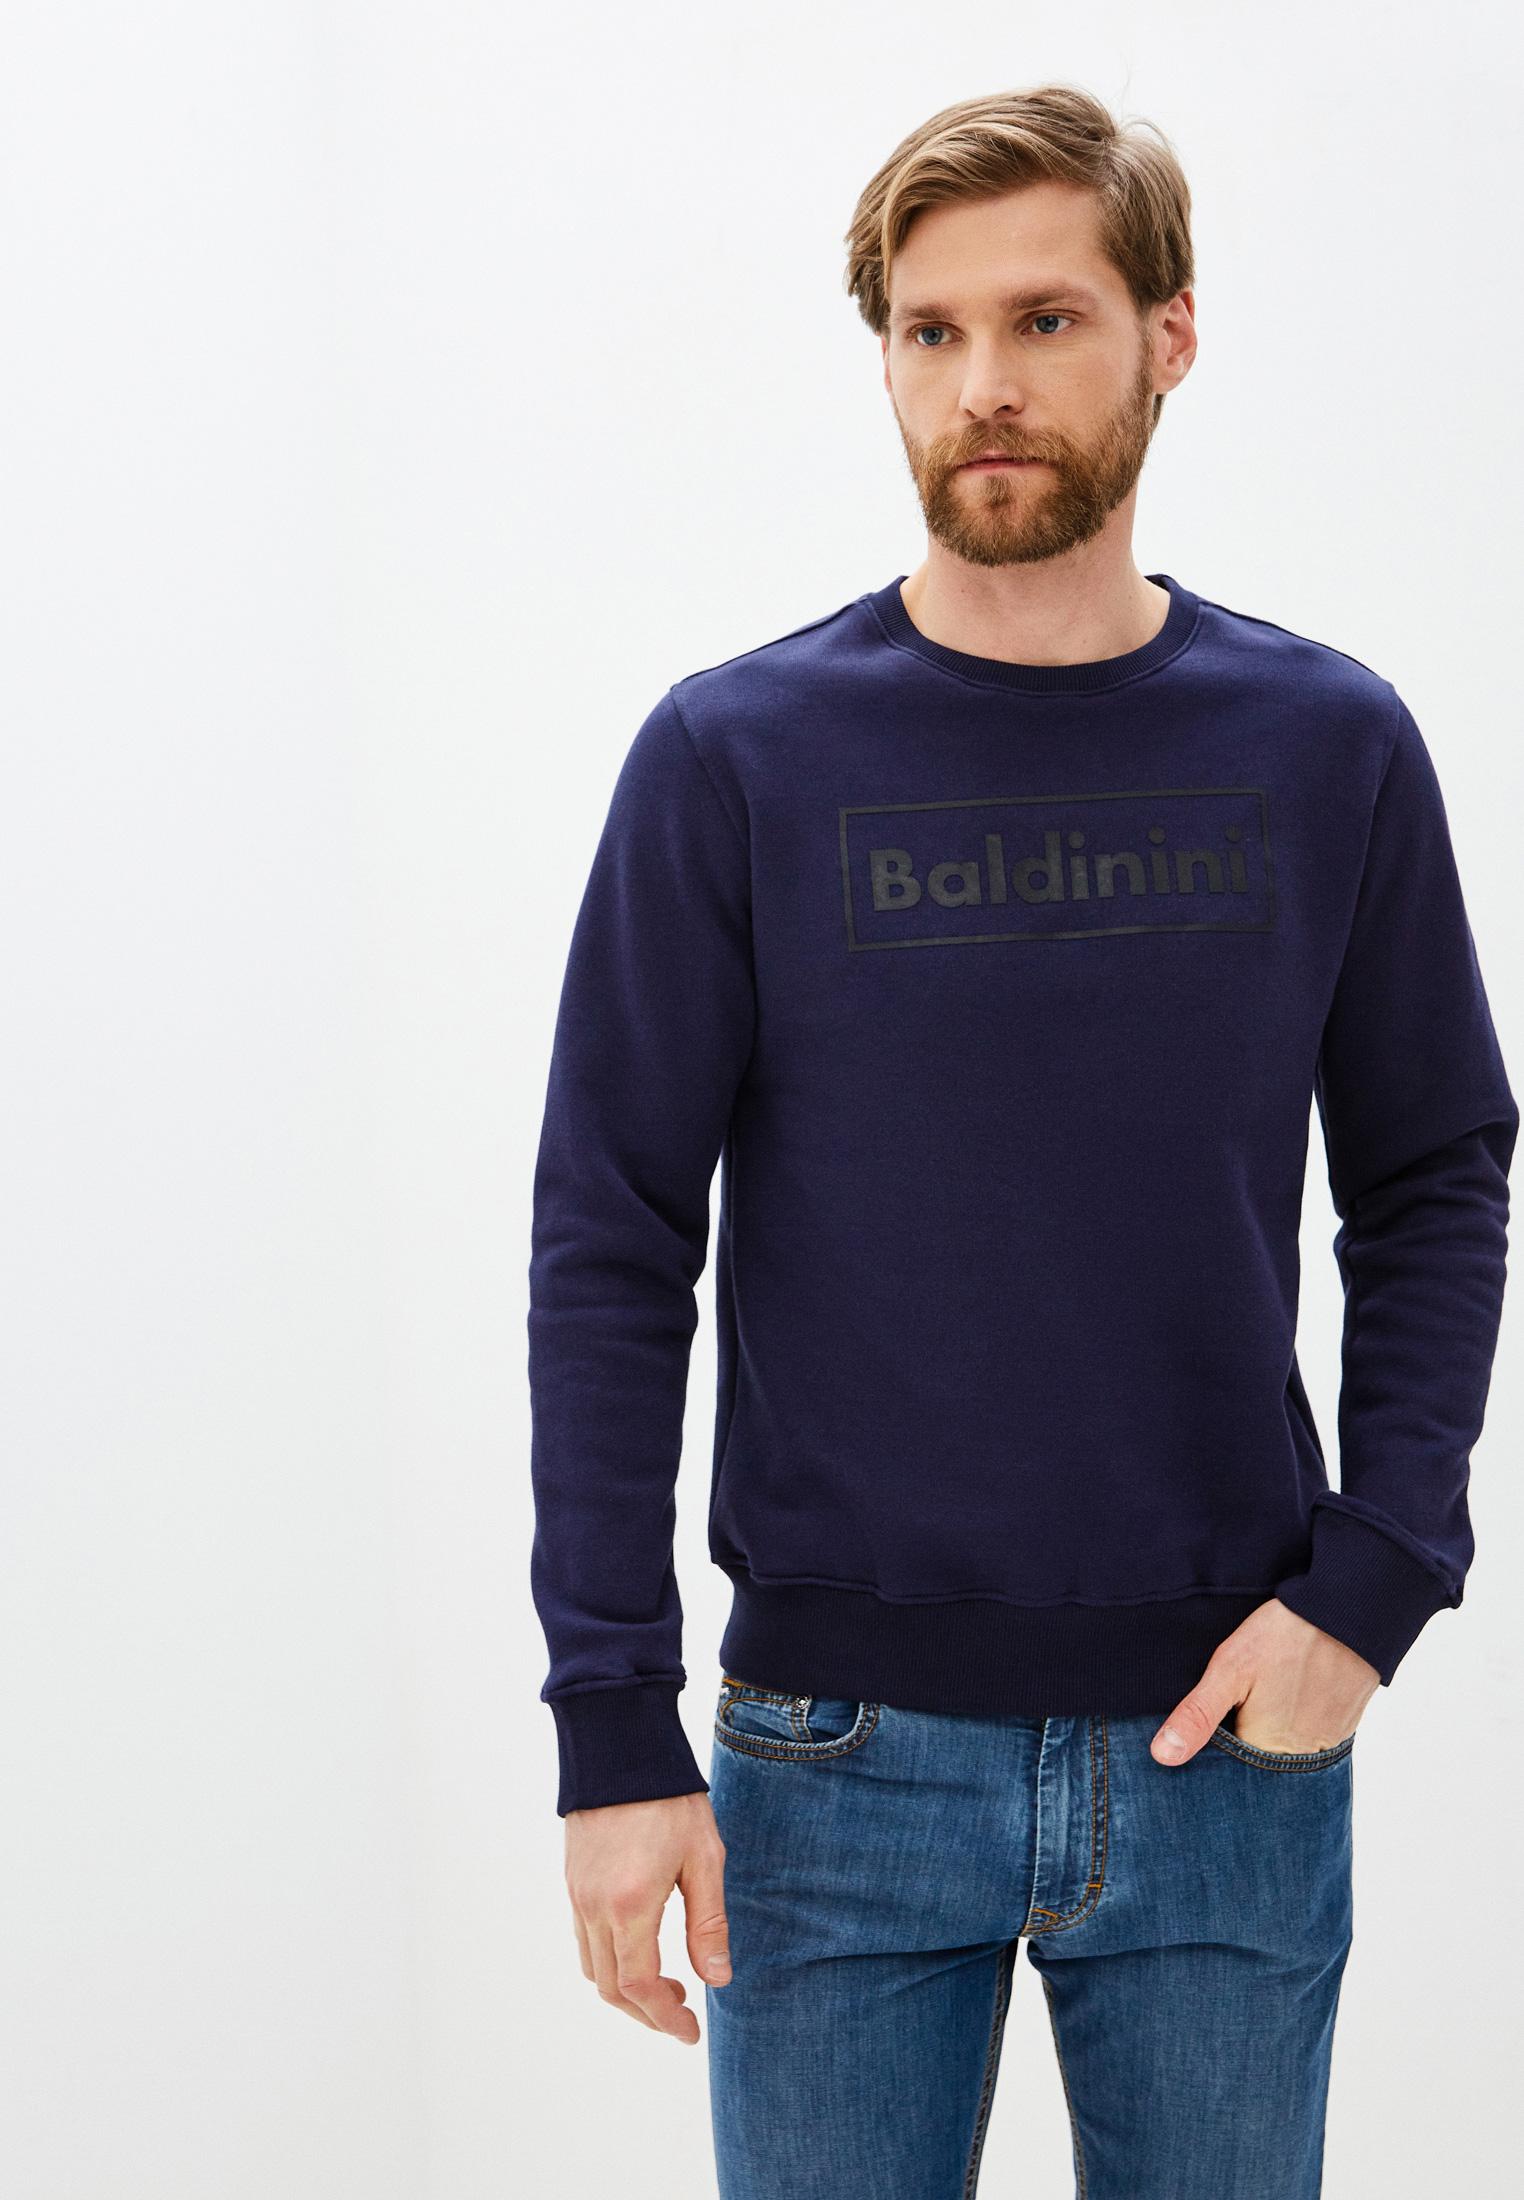 Свитер Baldinini (Балдинини) JJMR14K003FU11